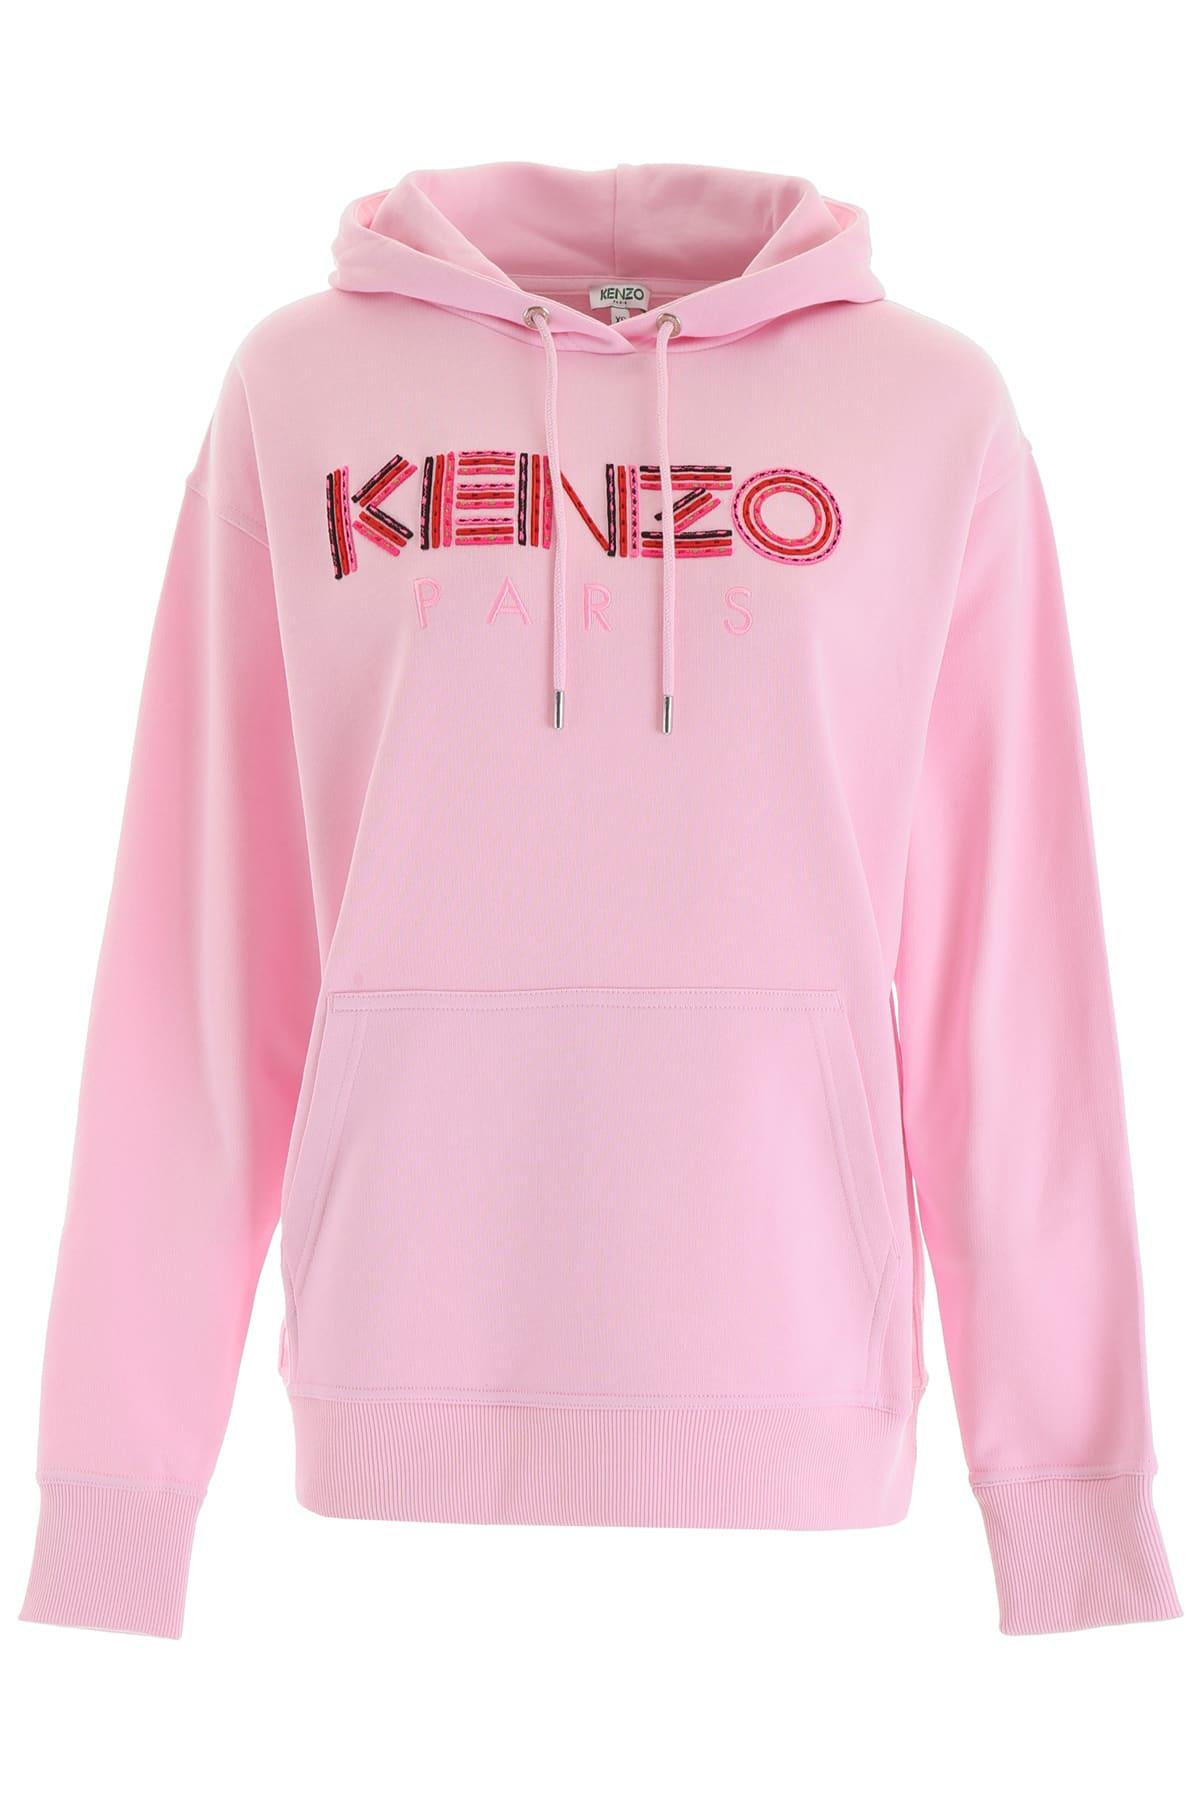 3d59db20 Kenzo Logo Hoodie